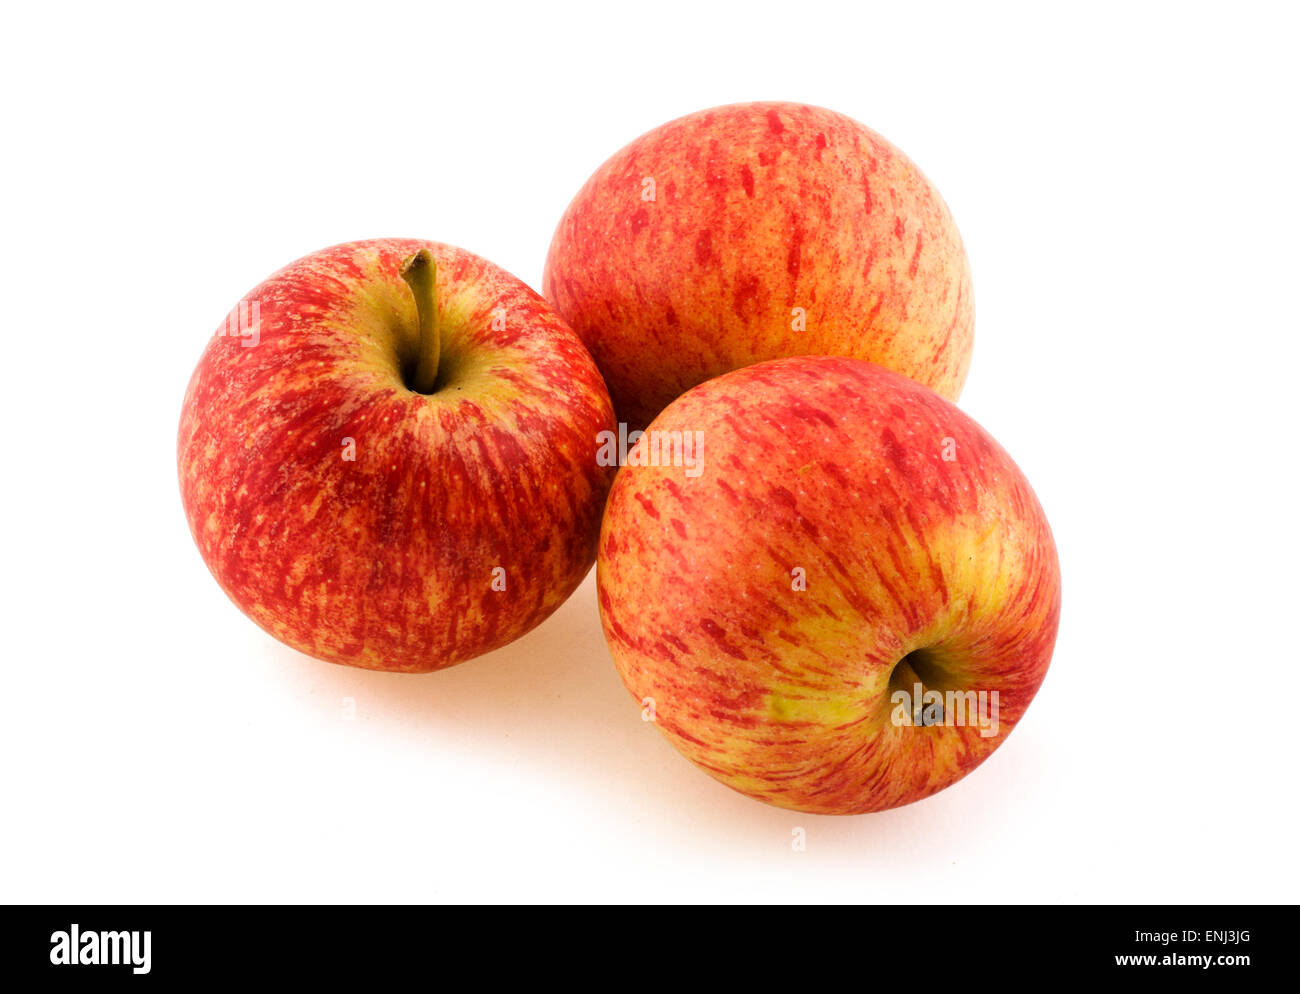 Gala Apples - Stock Image